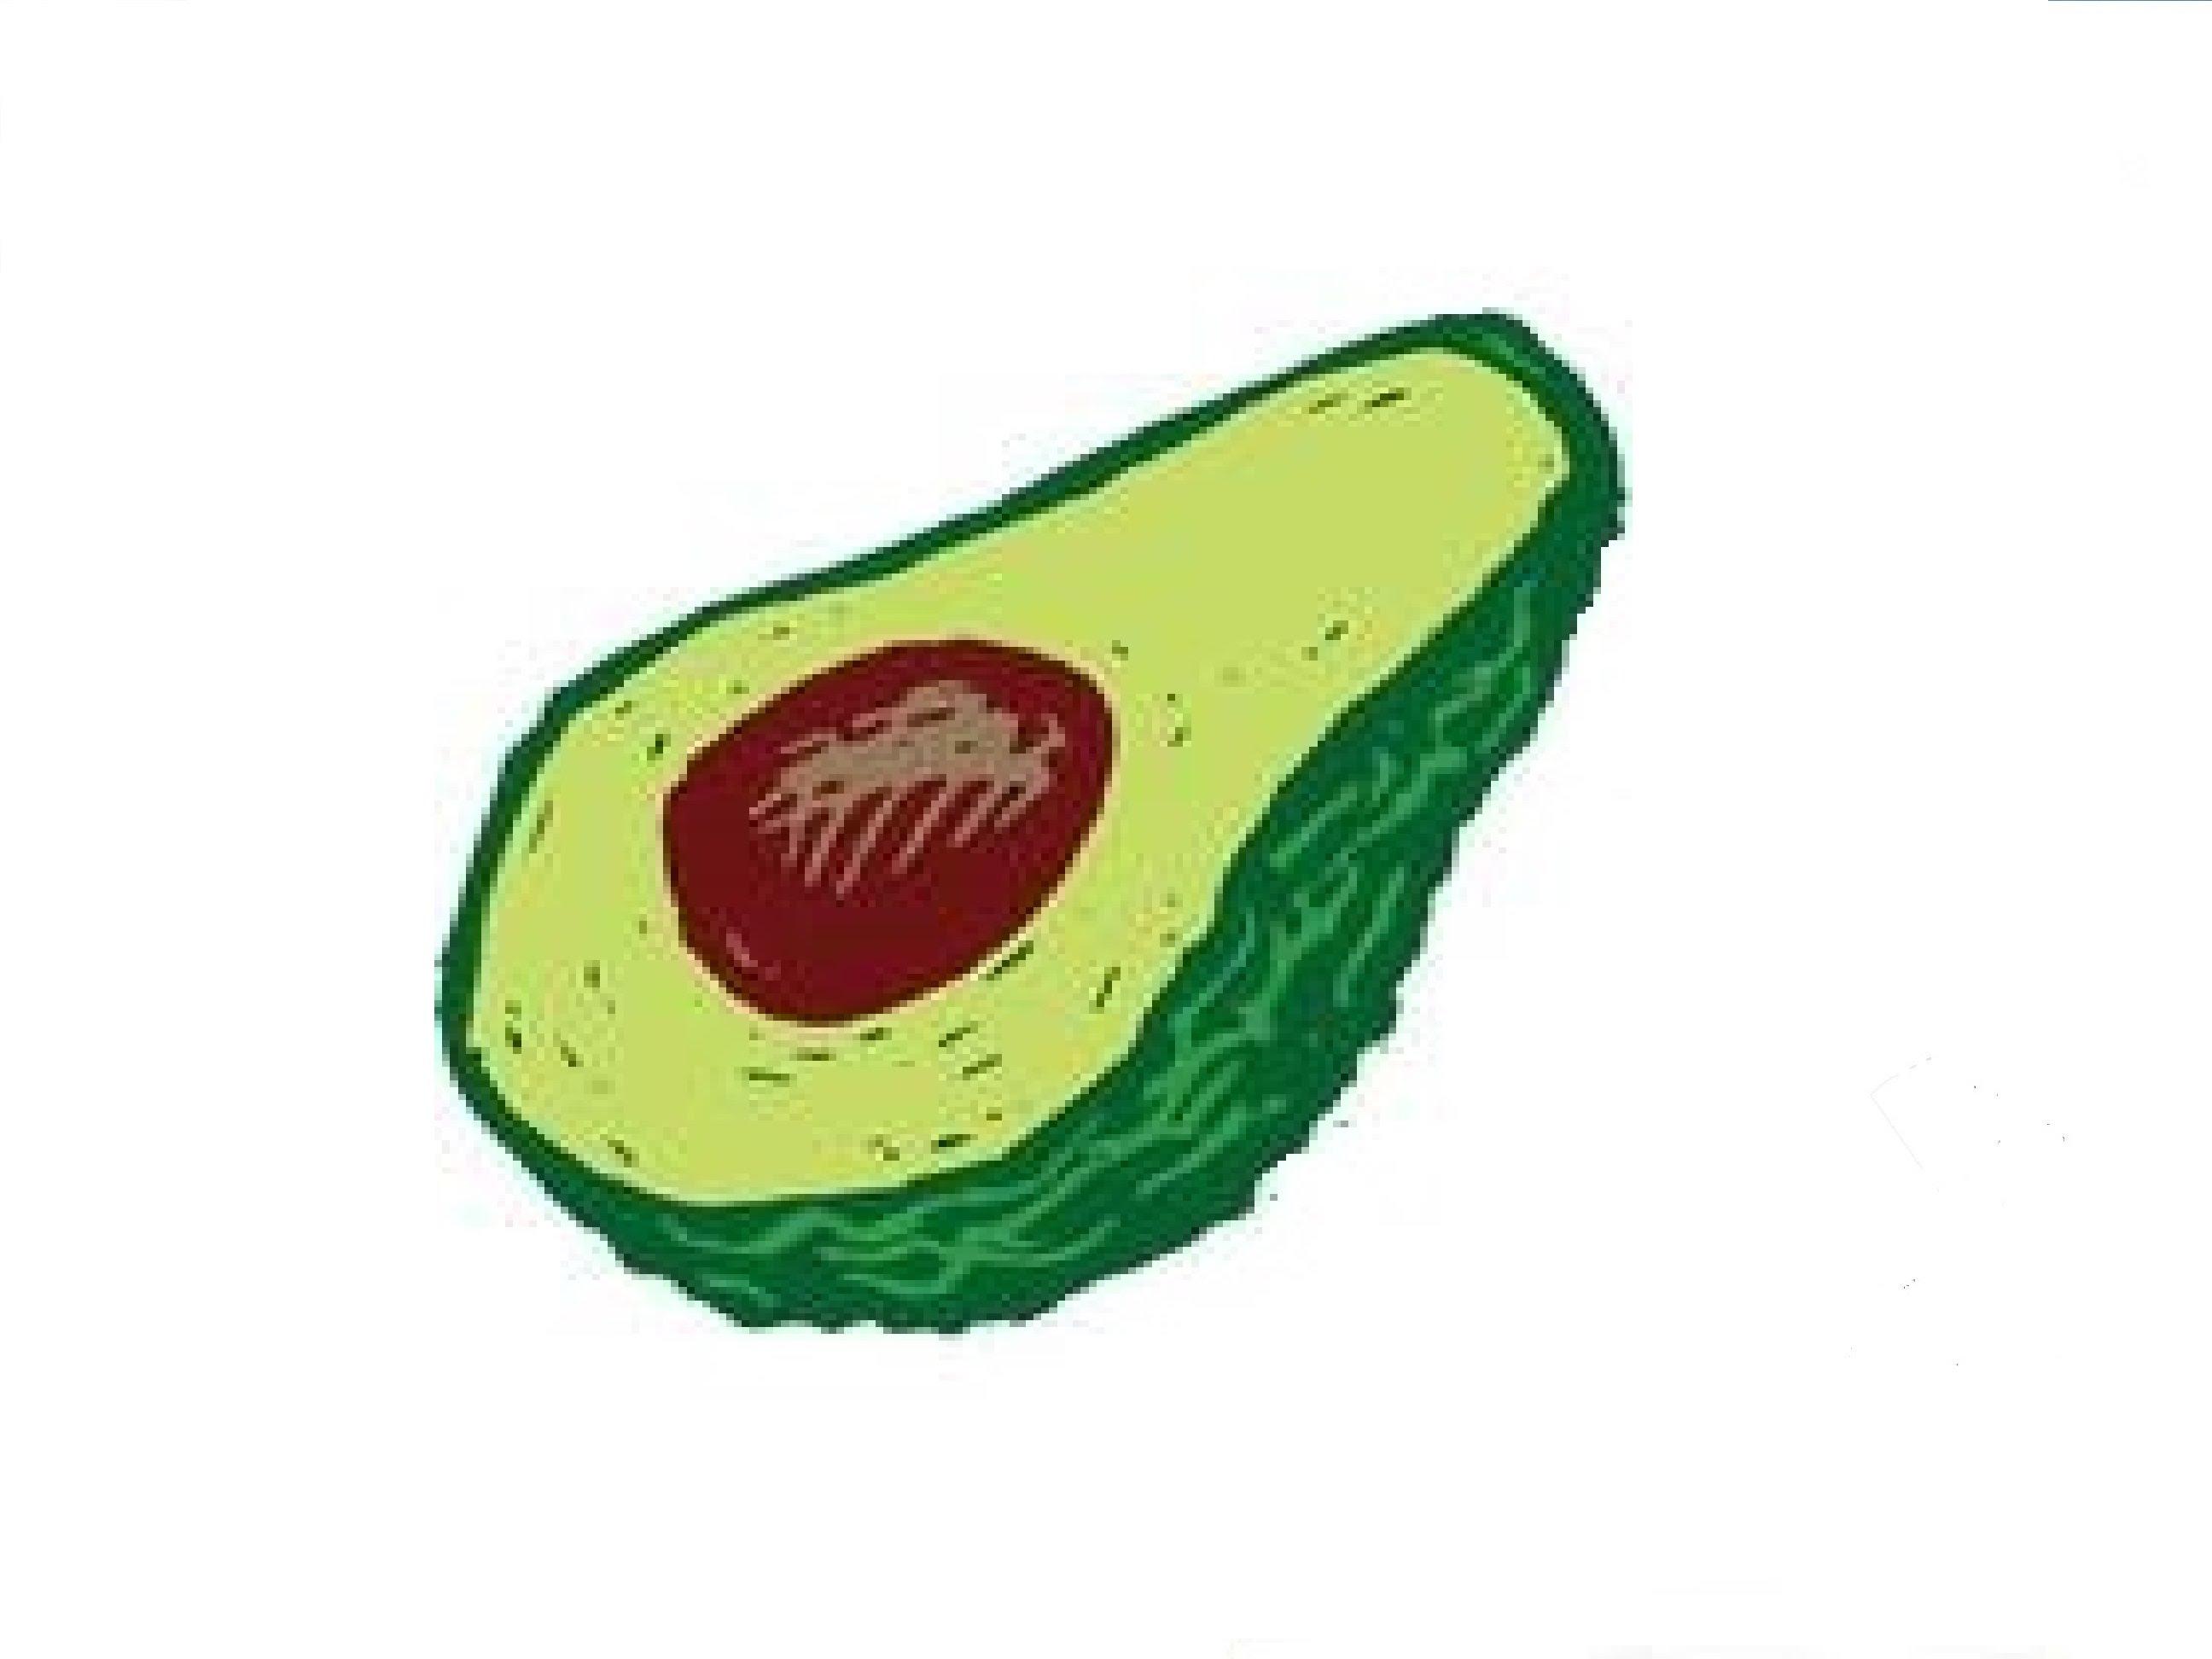 2592x1944 How To Draw An Avocado